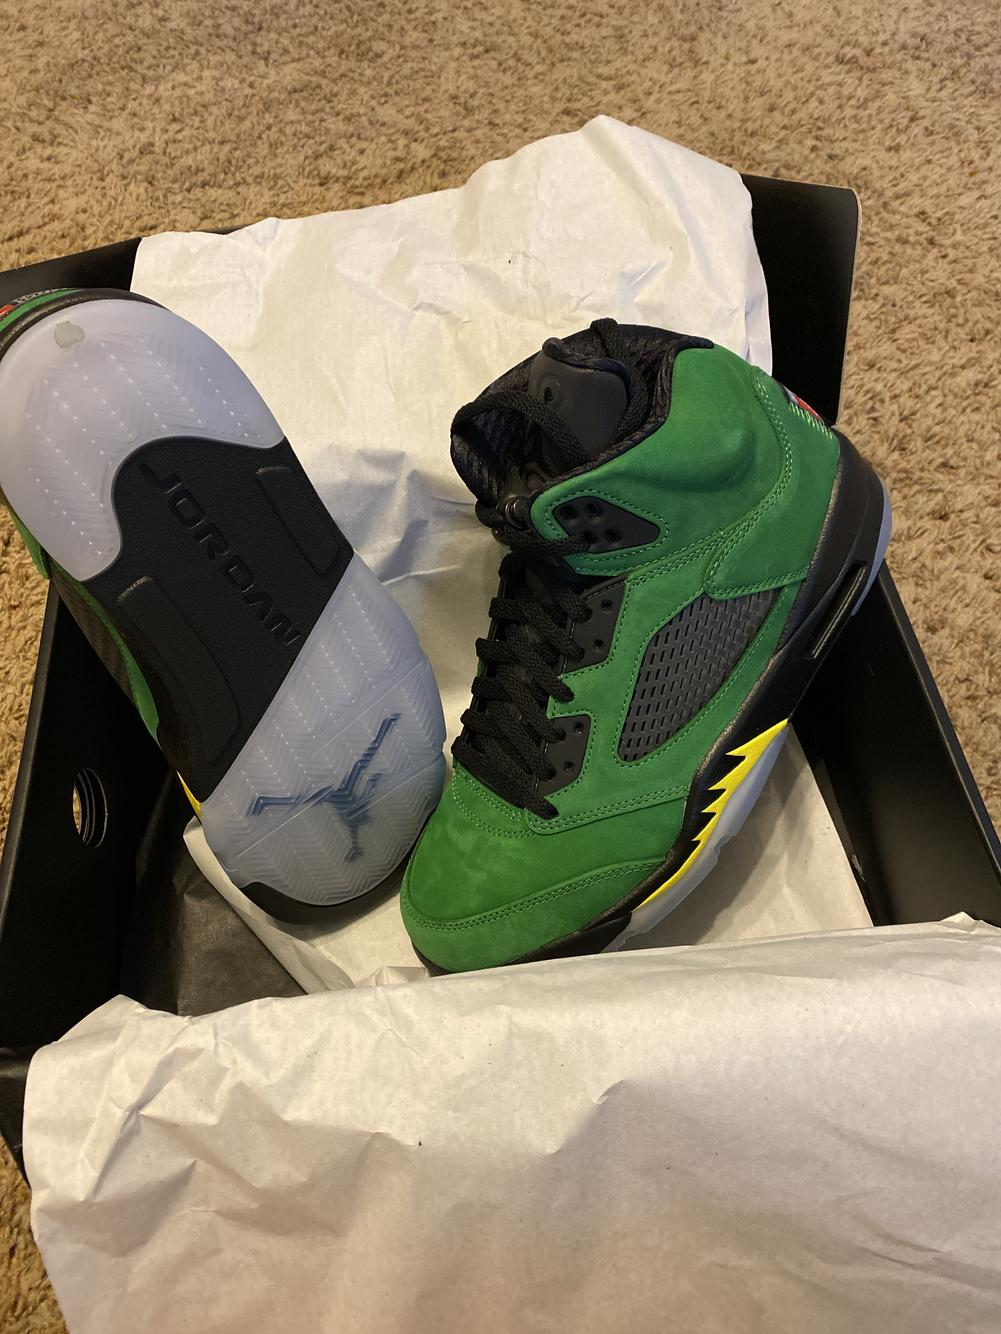 Green New Adult Men's Size 9.0 (Women's 10) Air Jordan Shoes